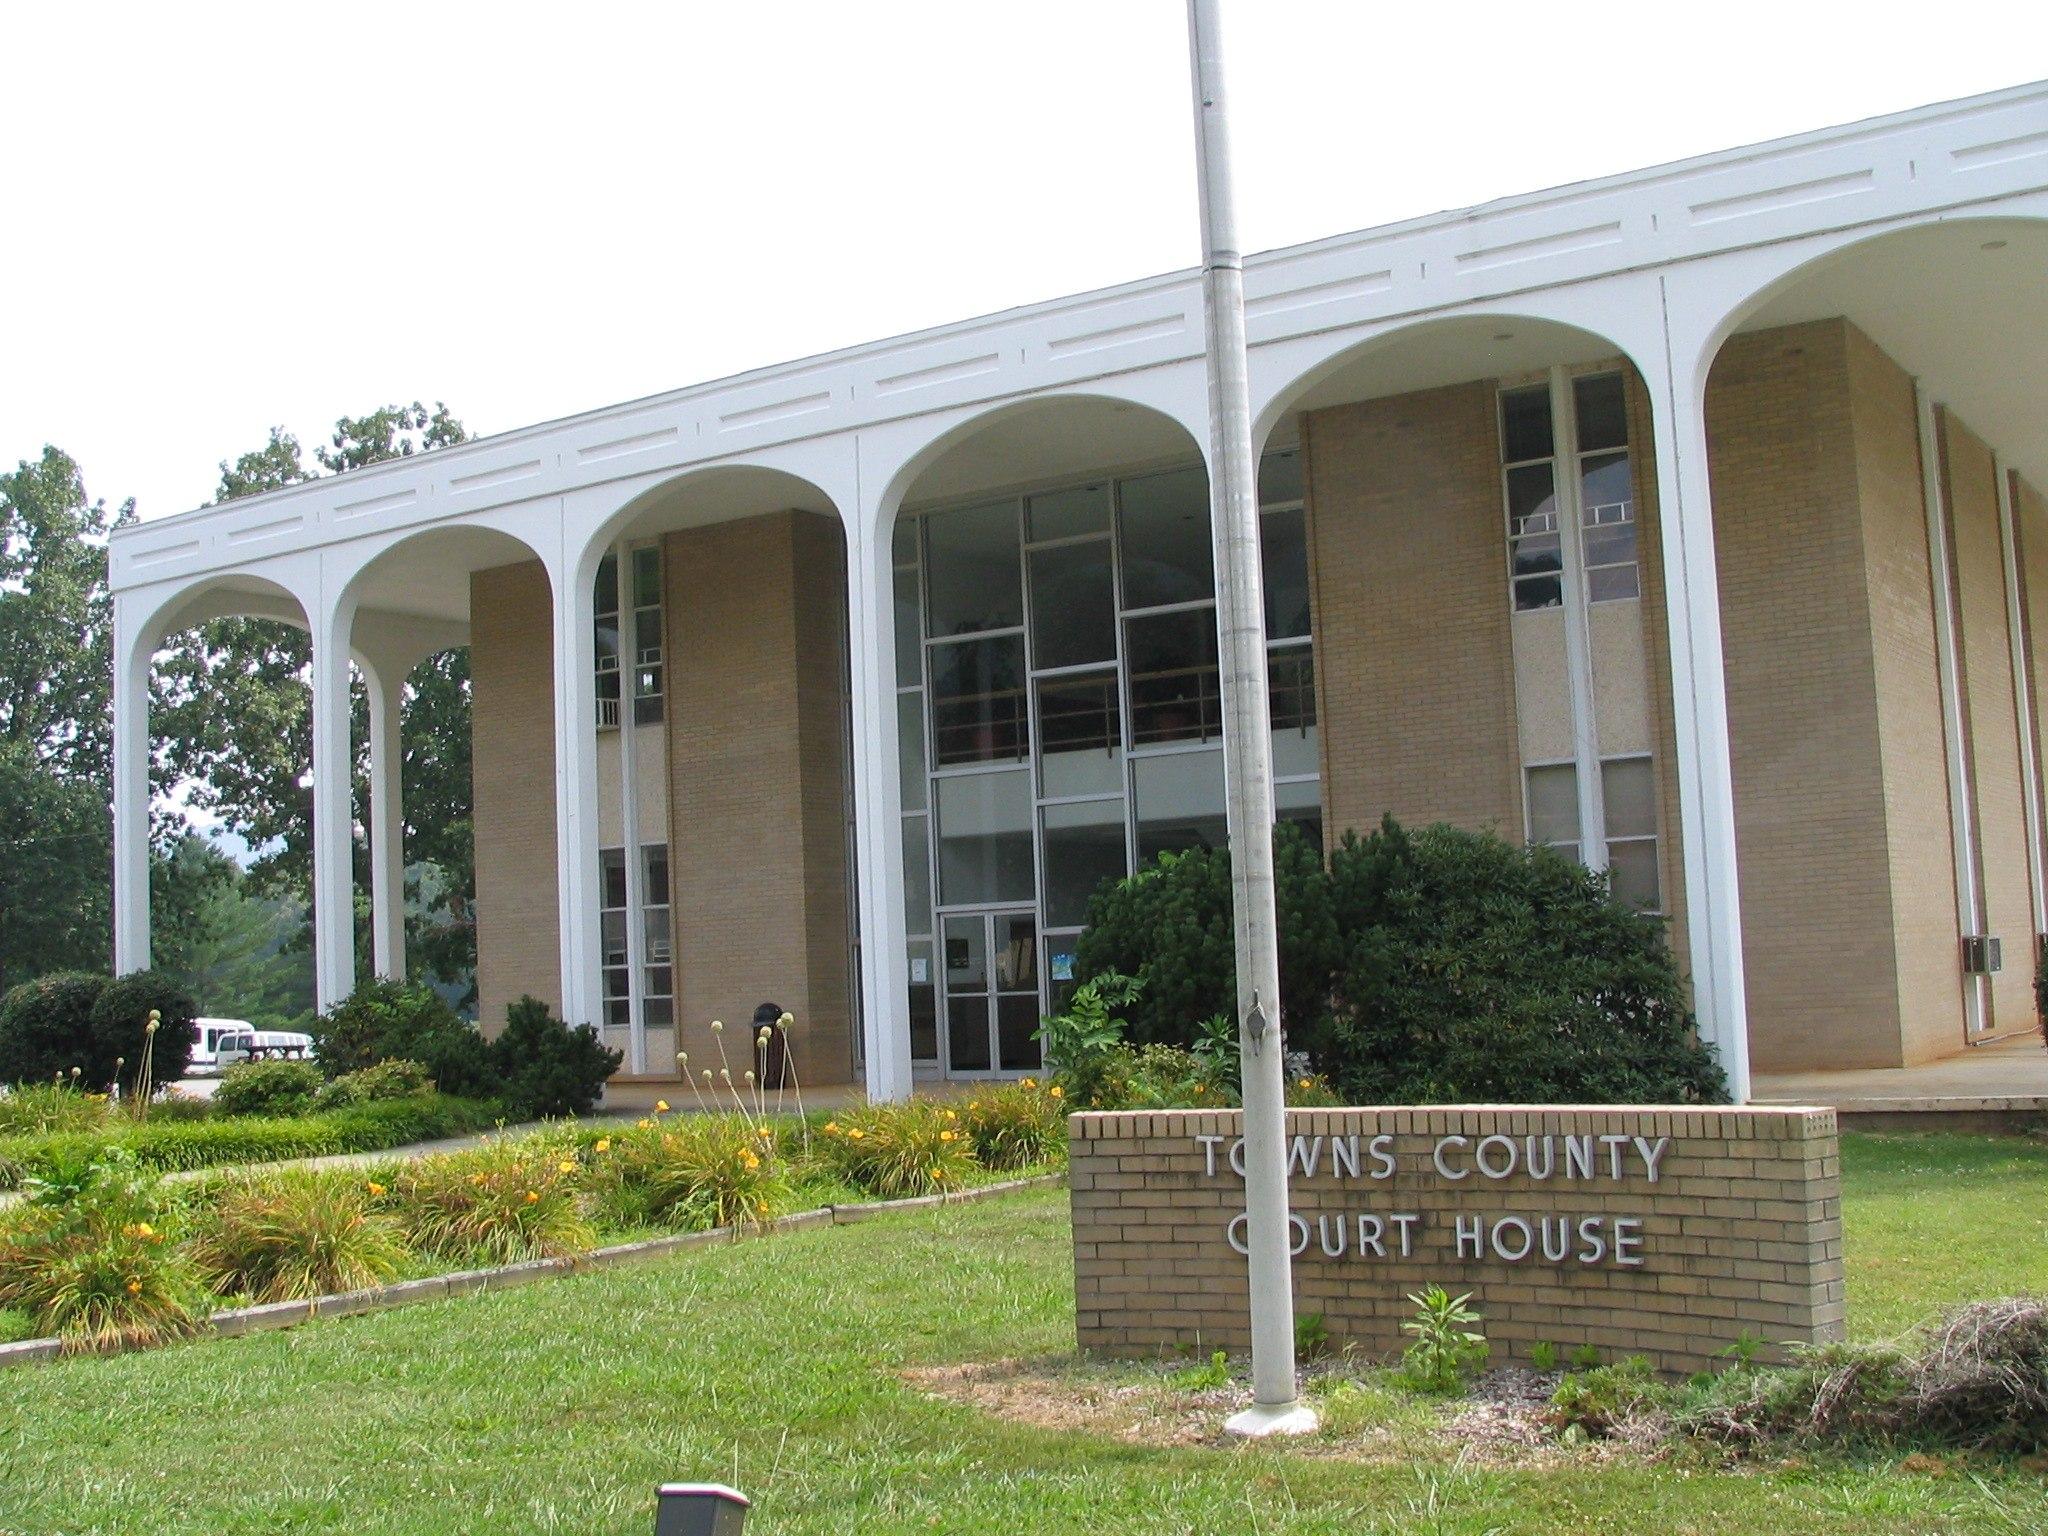 Towns County Georgia Courthouse